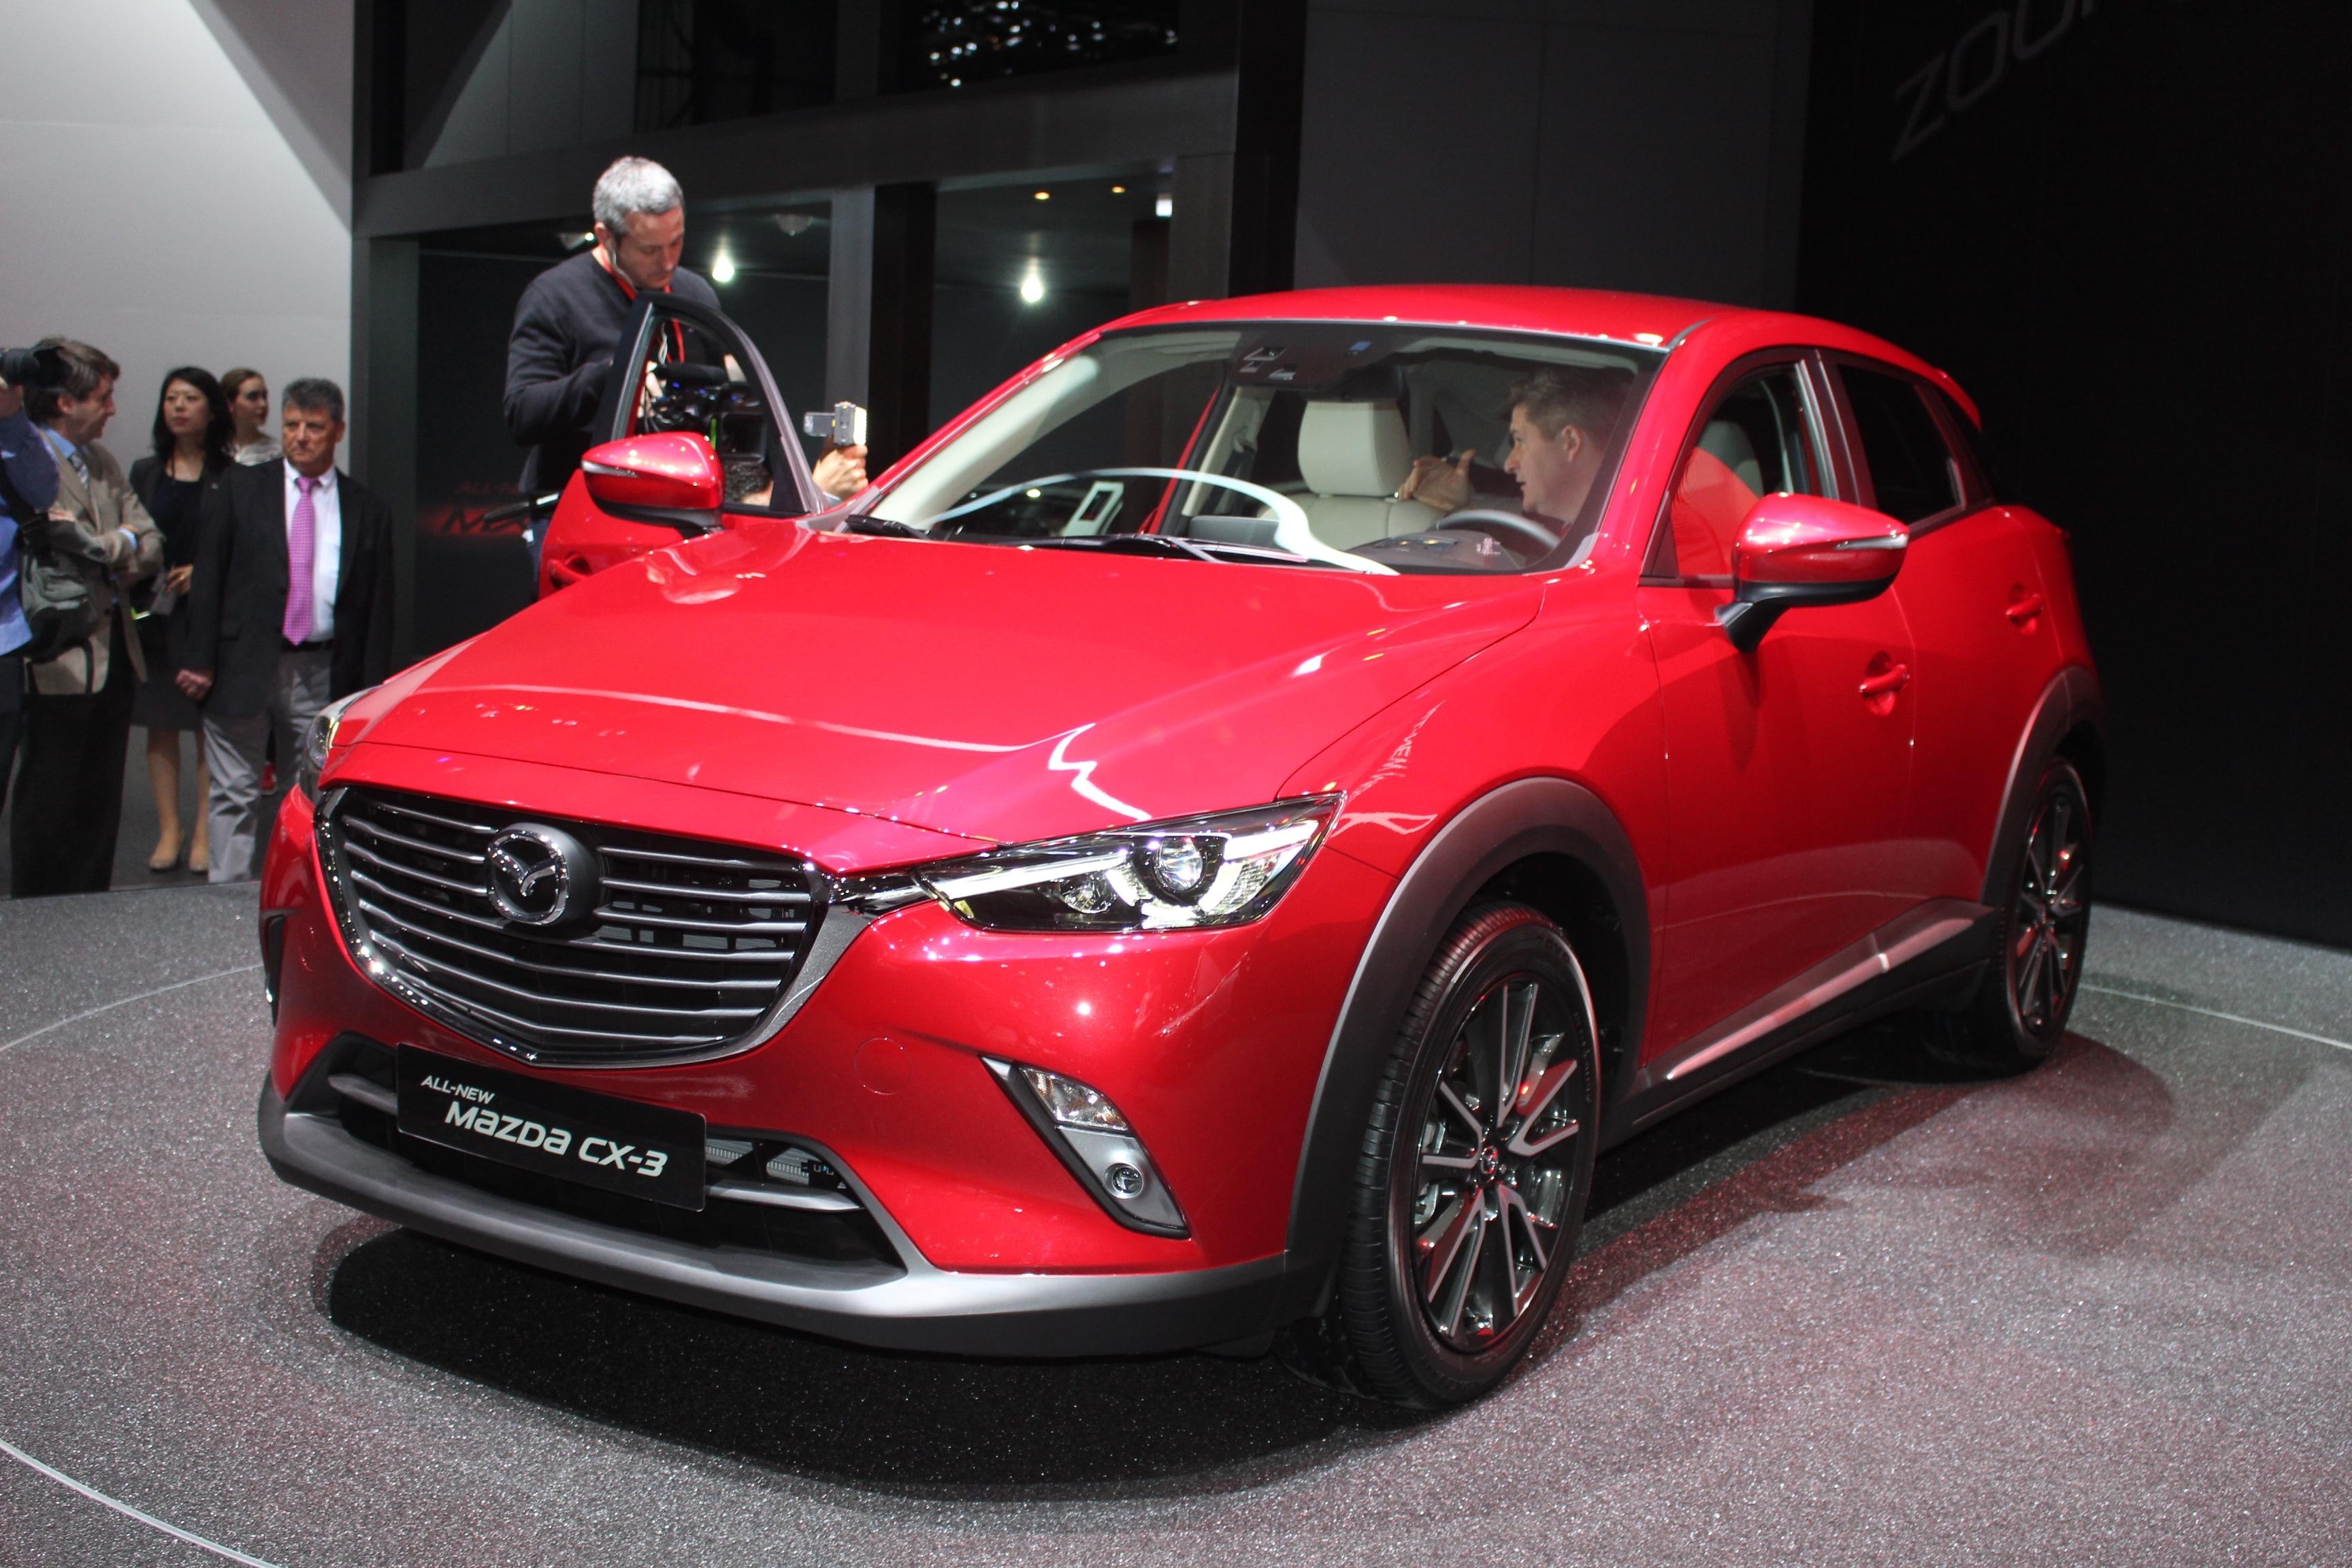 Mazda cx 3 redoutable vid o en direct du salon de gen ve 2015 - Salon de geneve 2015 billet ...